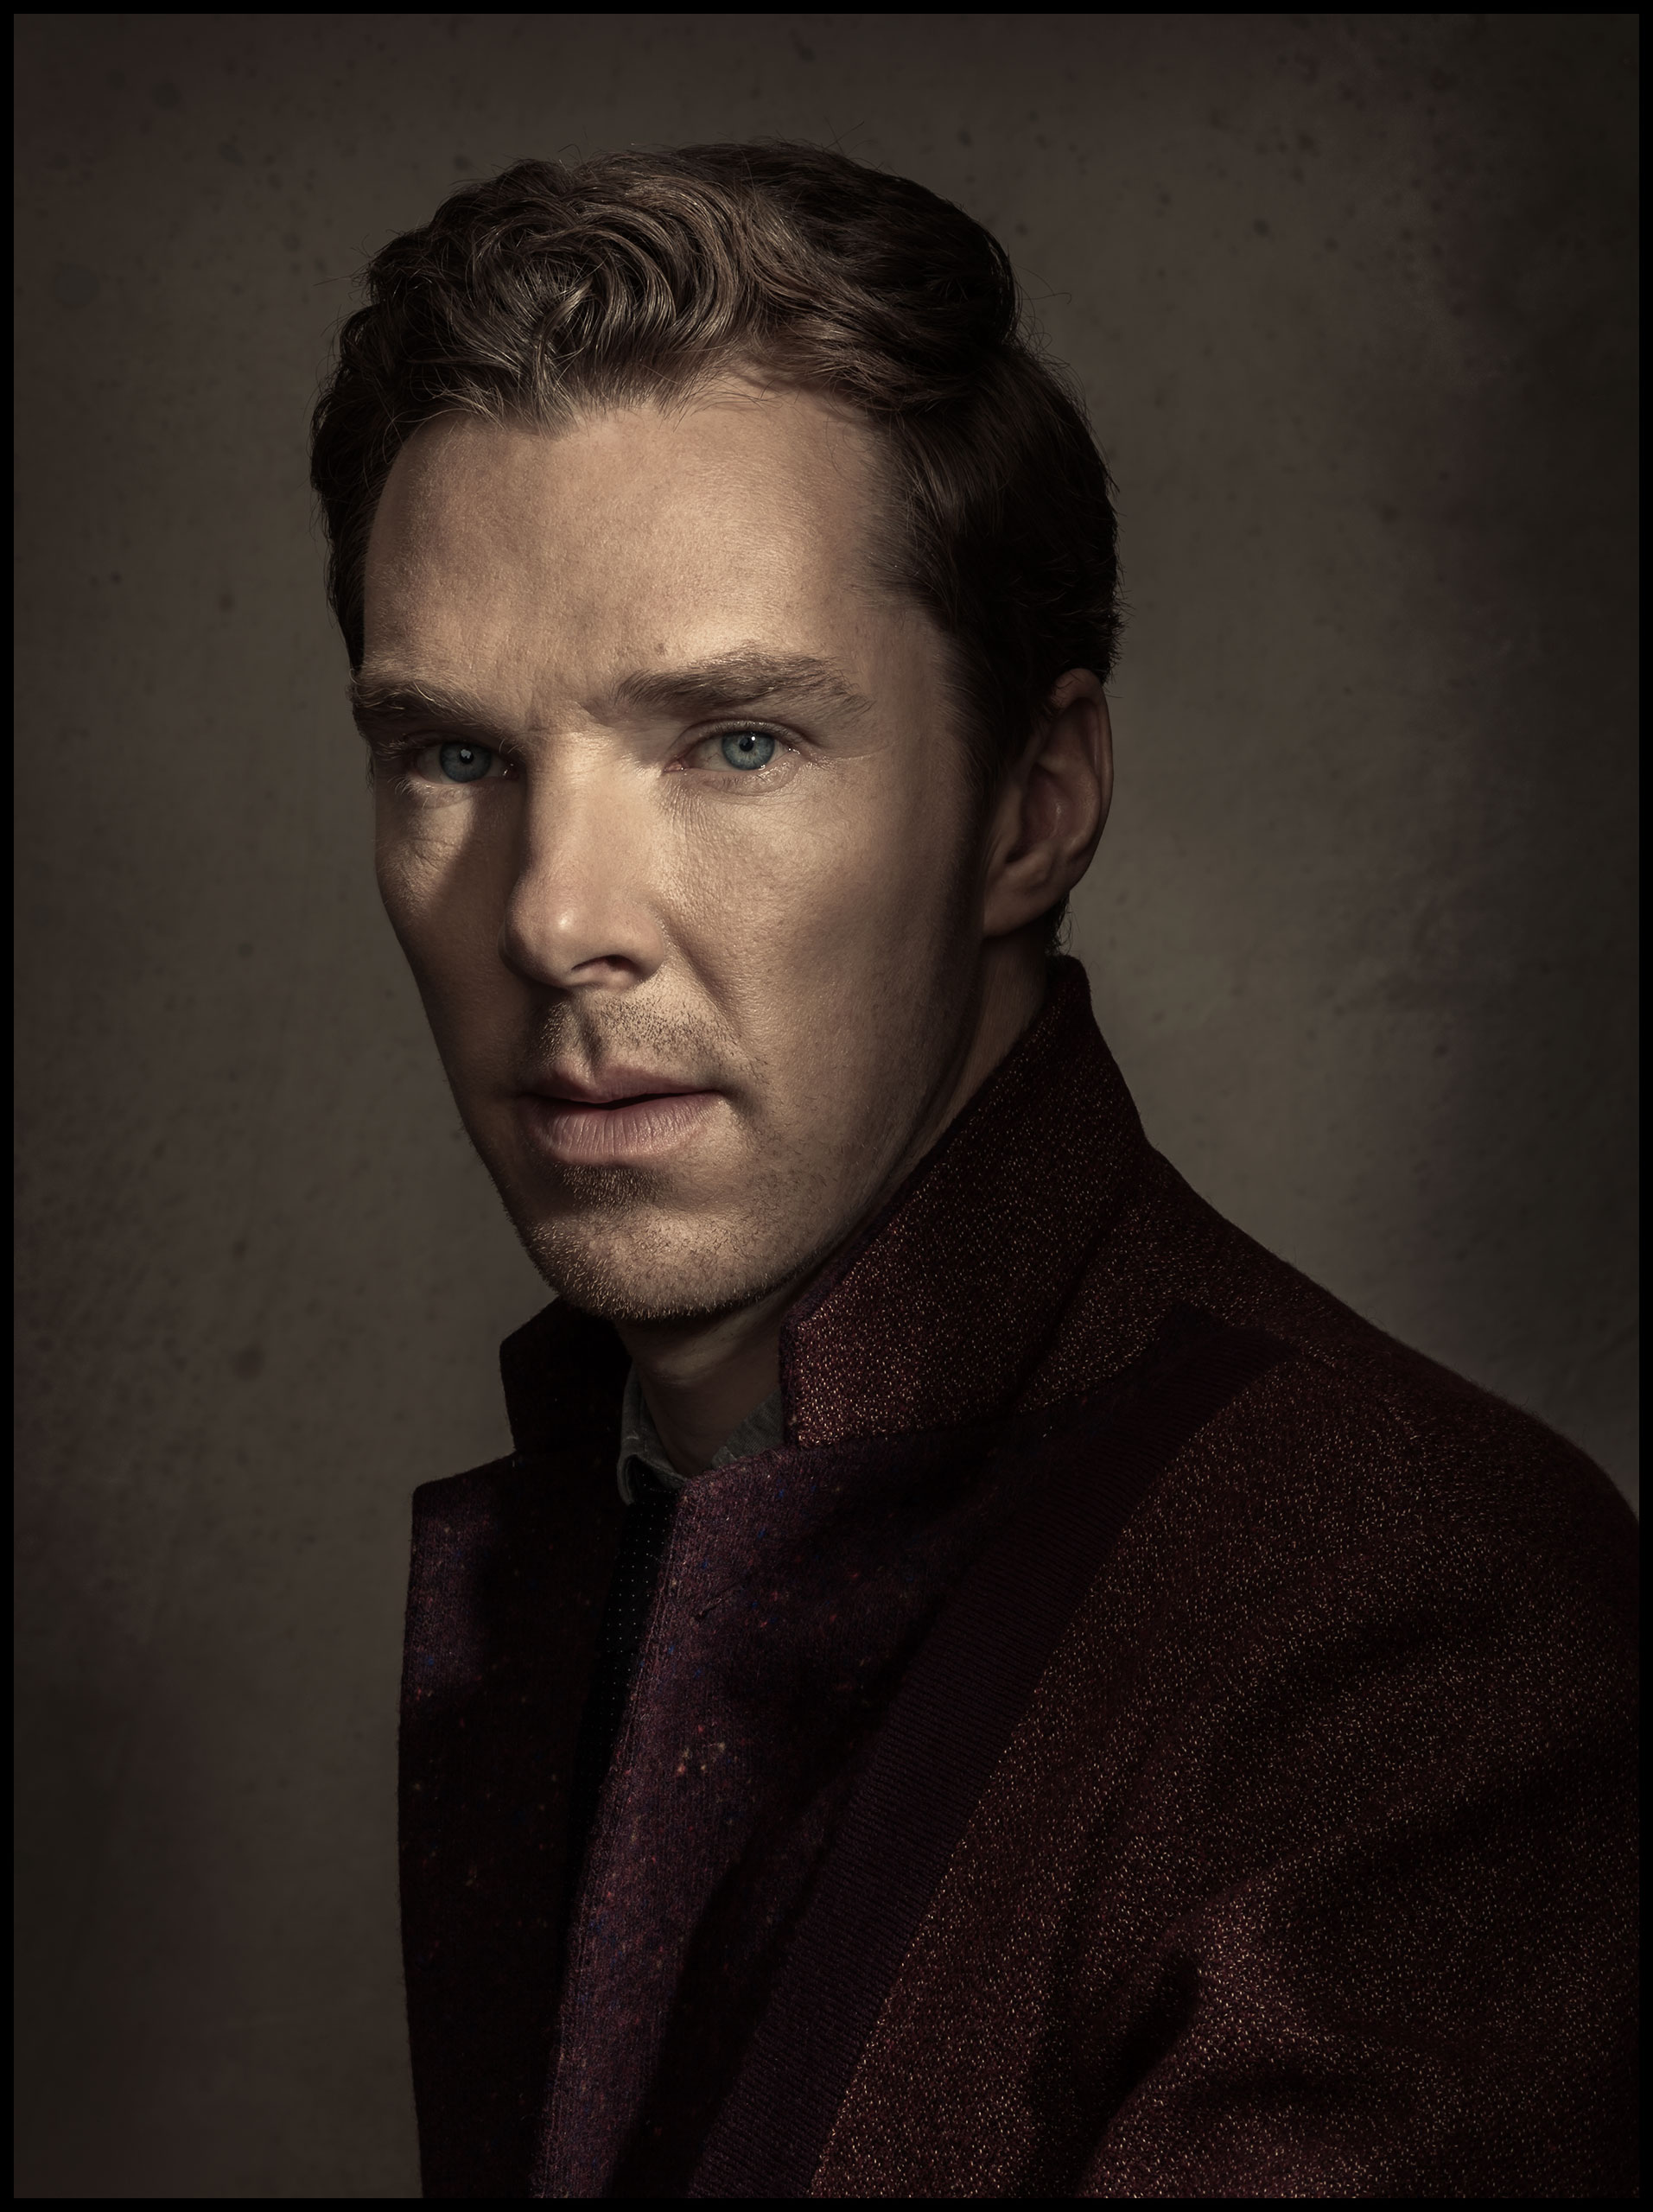 Portrait of actor Benedict Cumberbatch photographed in California on November 9, 2014.